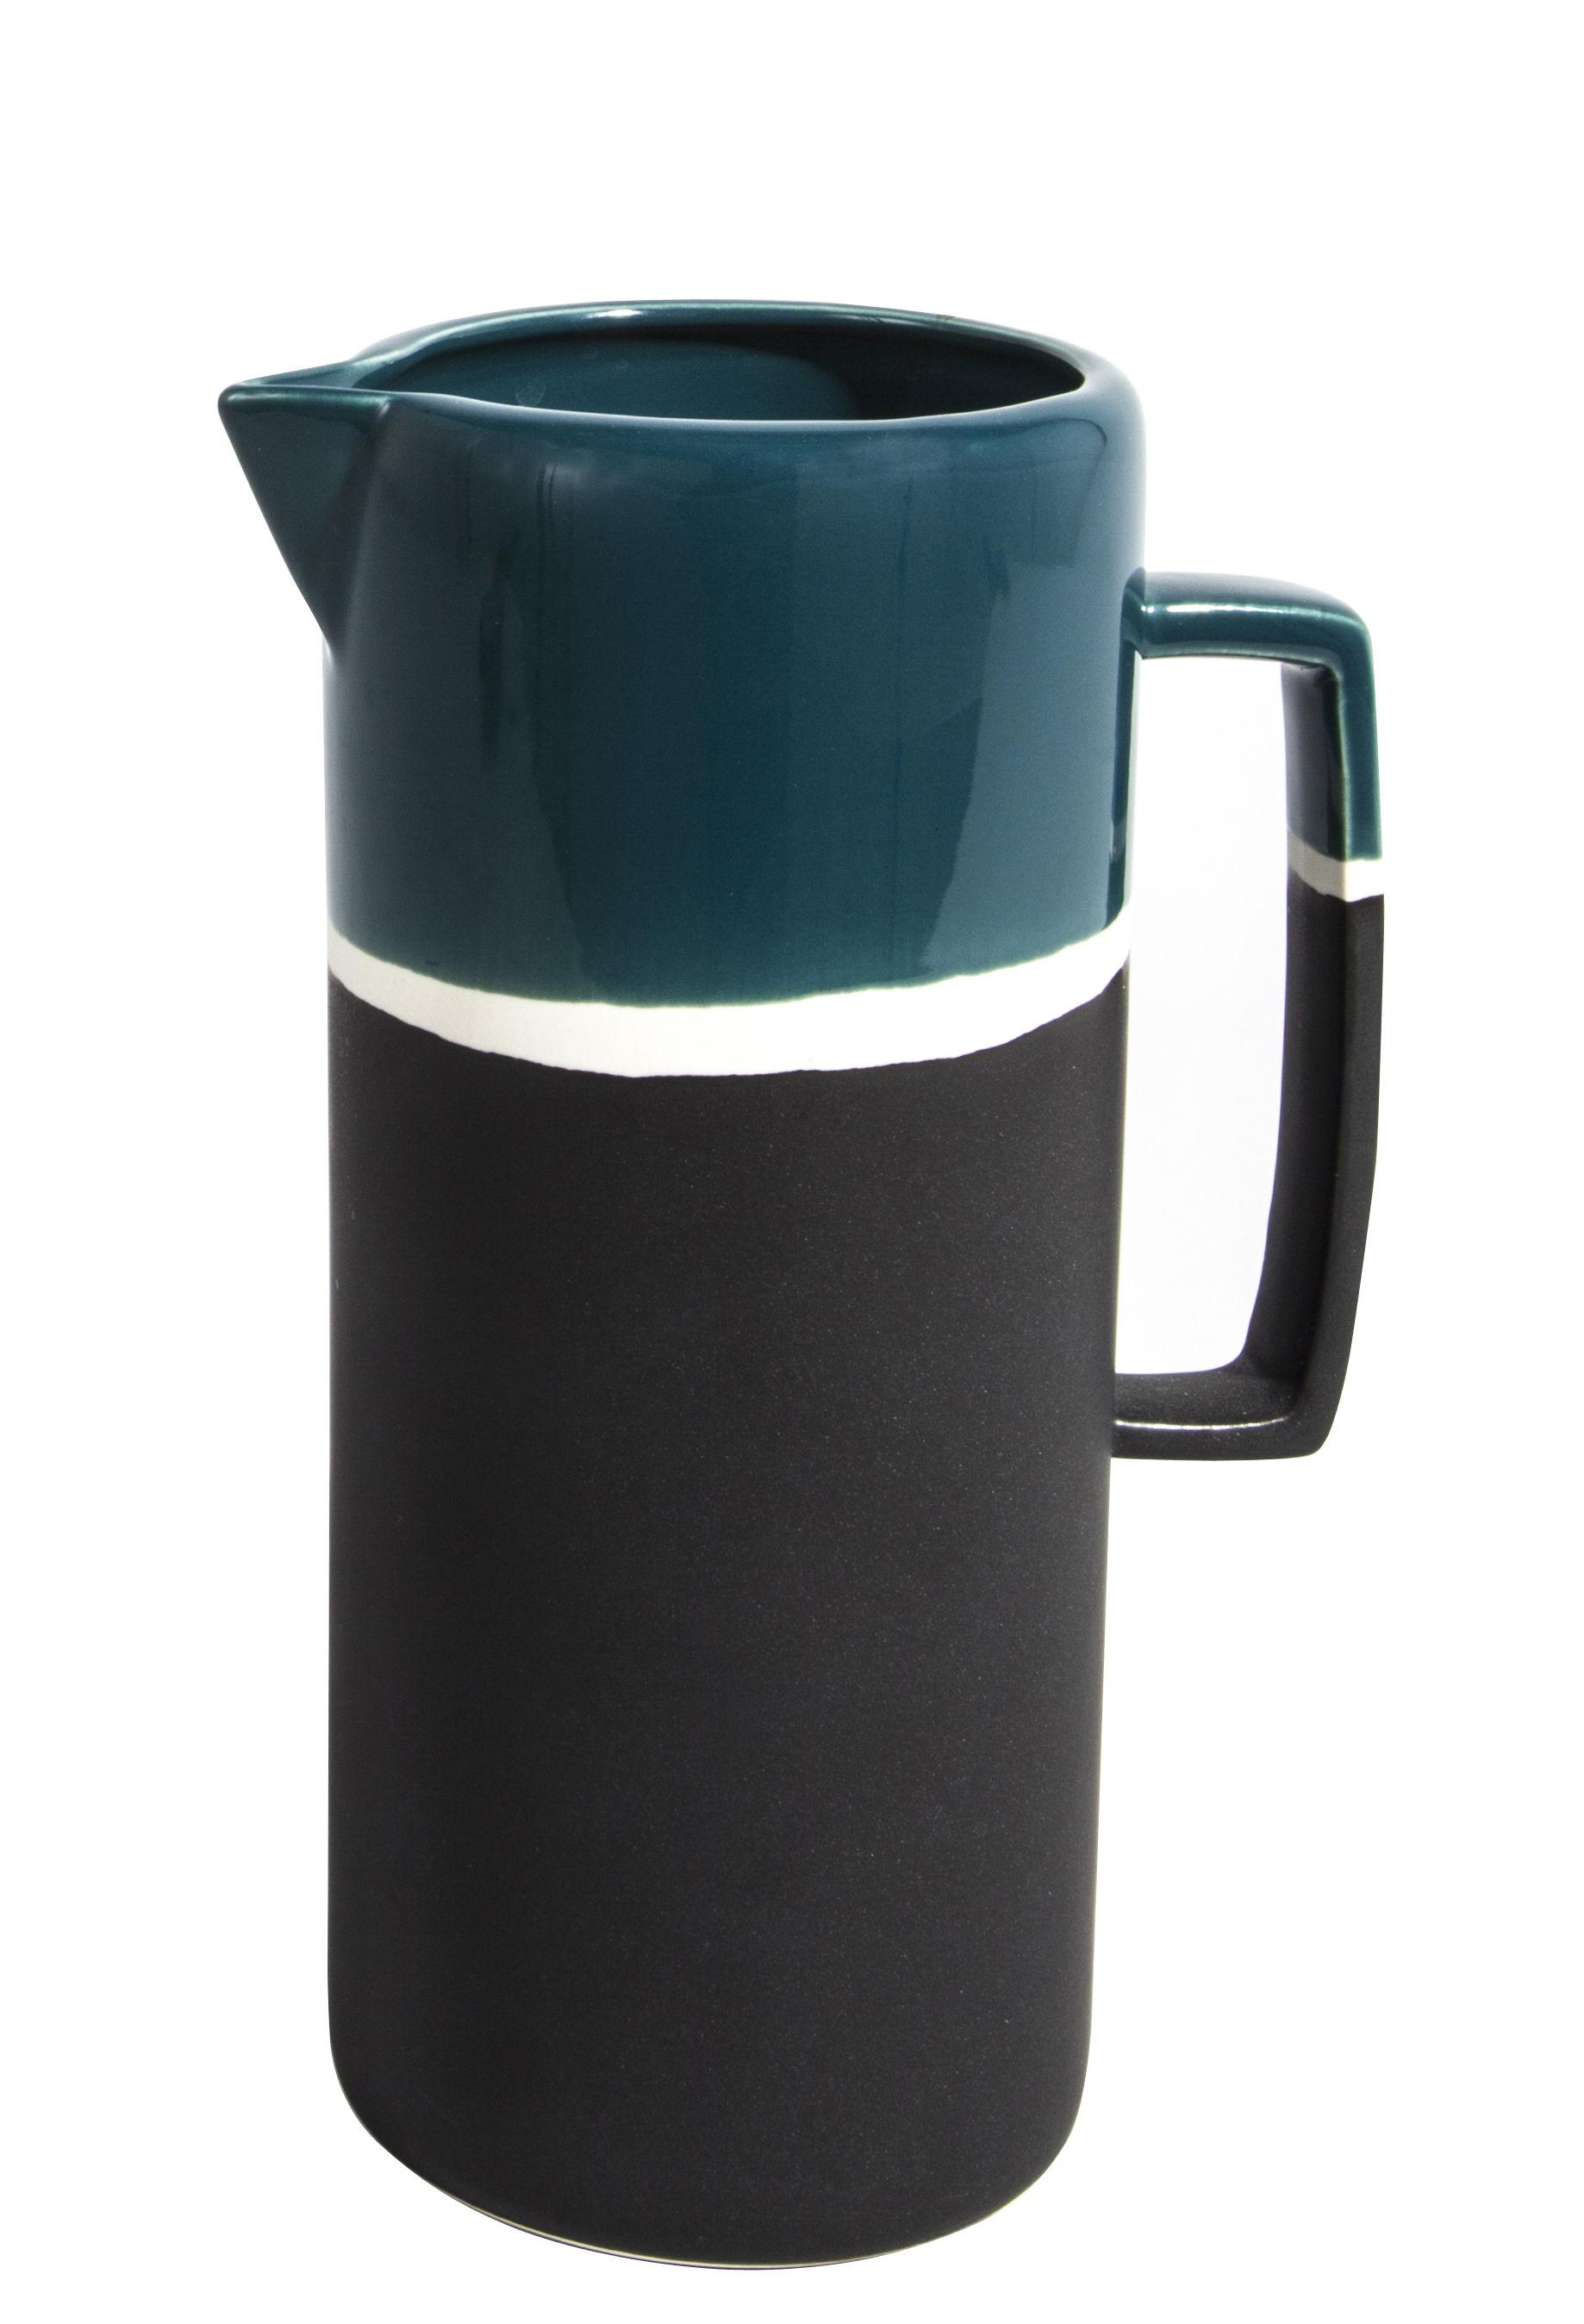 Tableware - Water Carafes & Wine Decanters - Sicilia Jug by Maison Sarah Lavoine - Sarah blue - Painted enameled stoneware